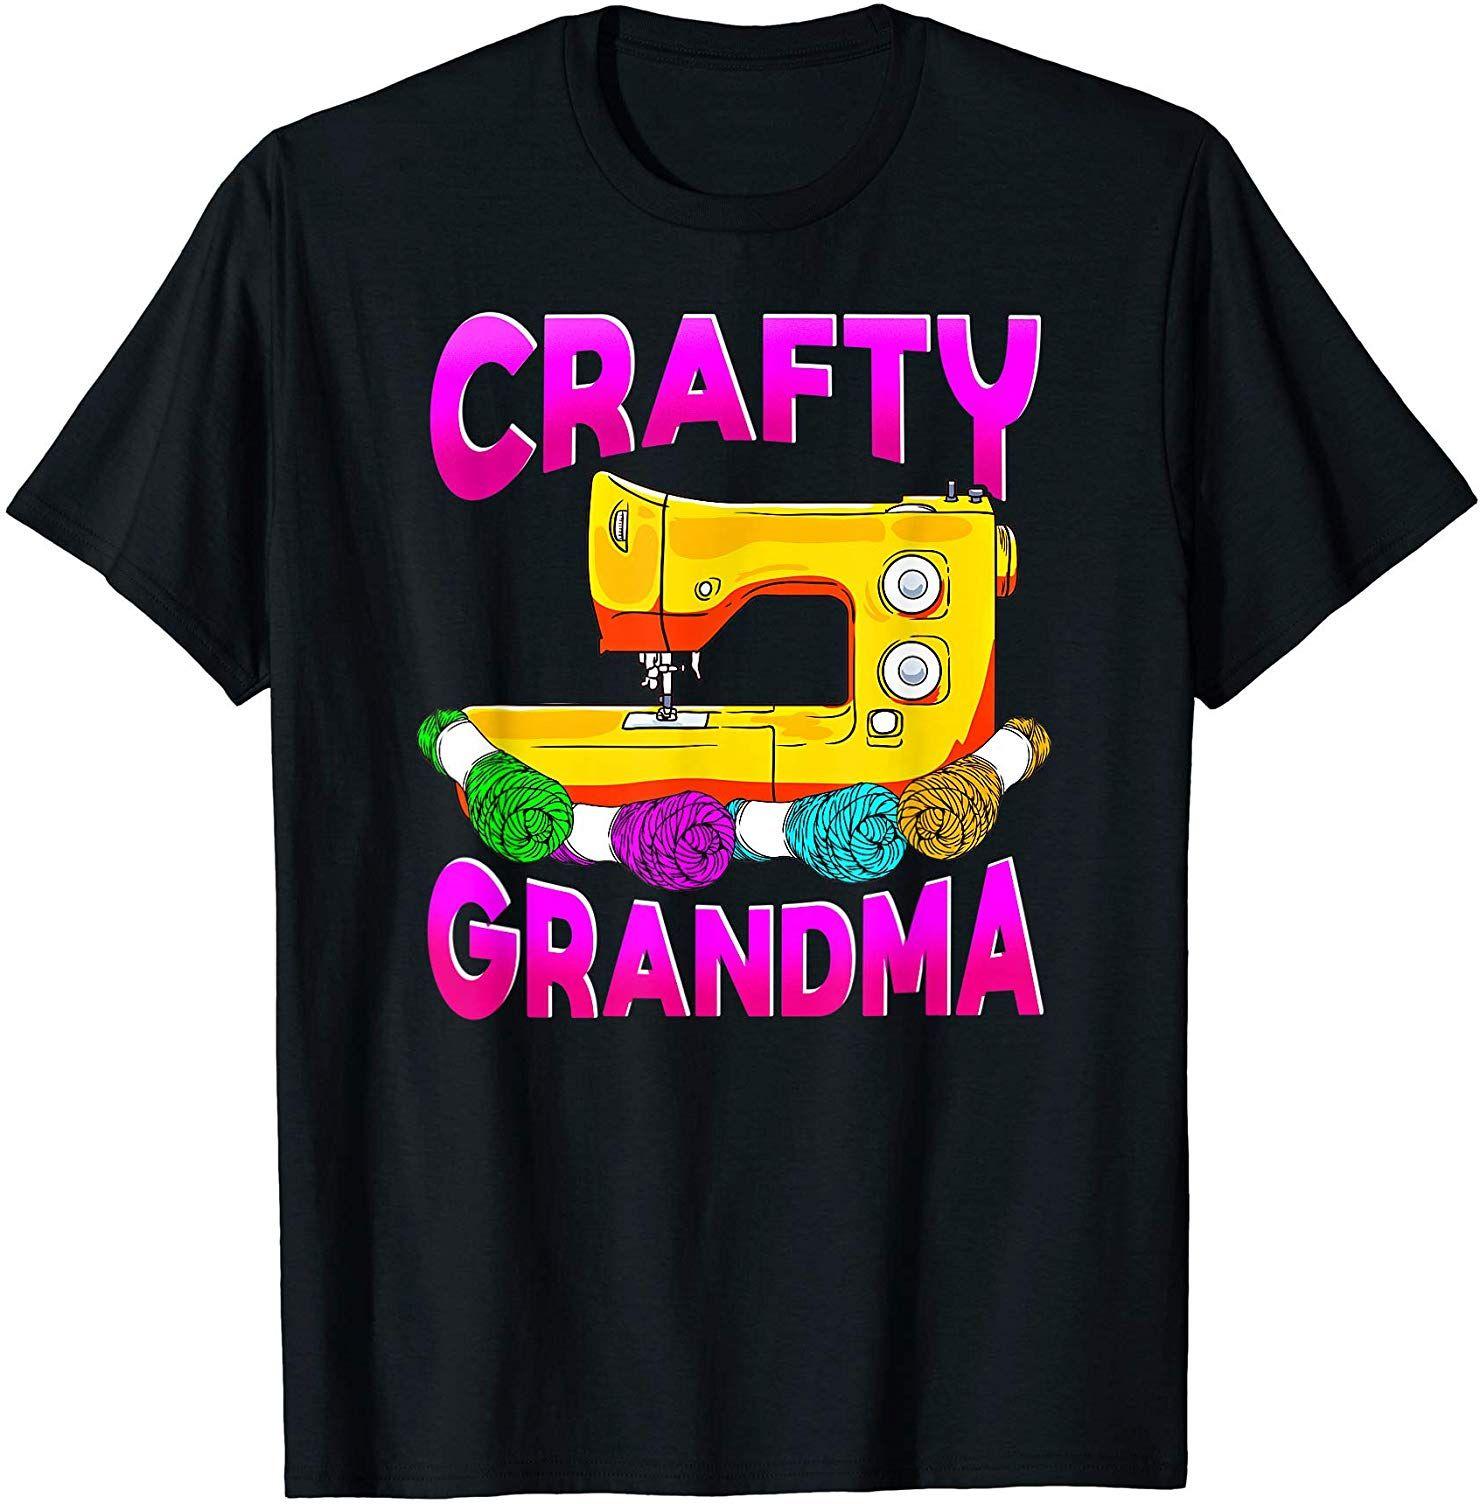 Crafty grandma sewing machine gift idea for grandmother